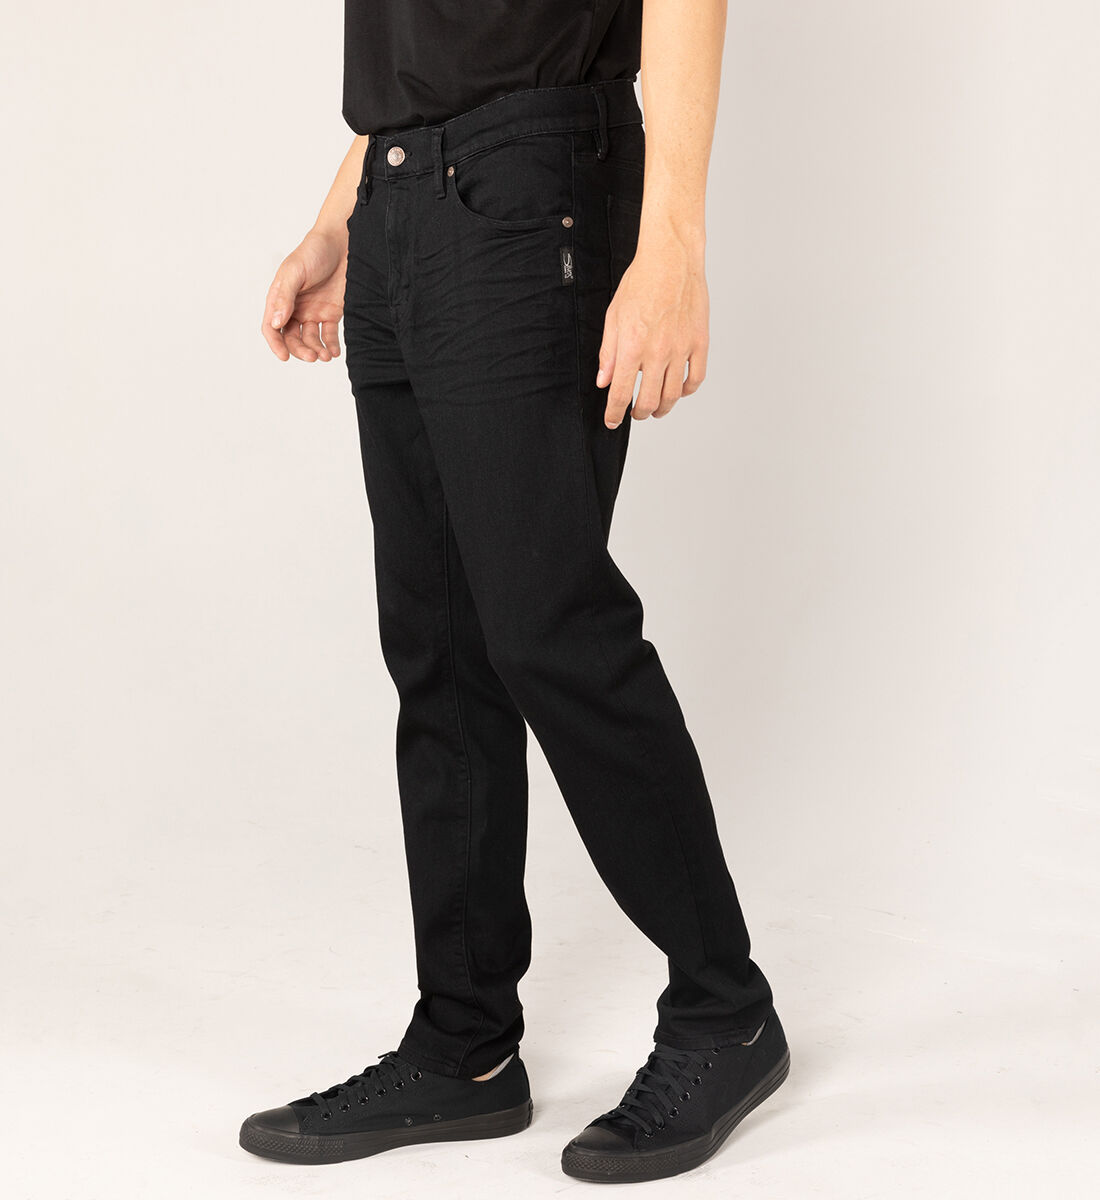 Kenaston  Slim Fit Slim Leg Jeans Side